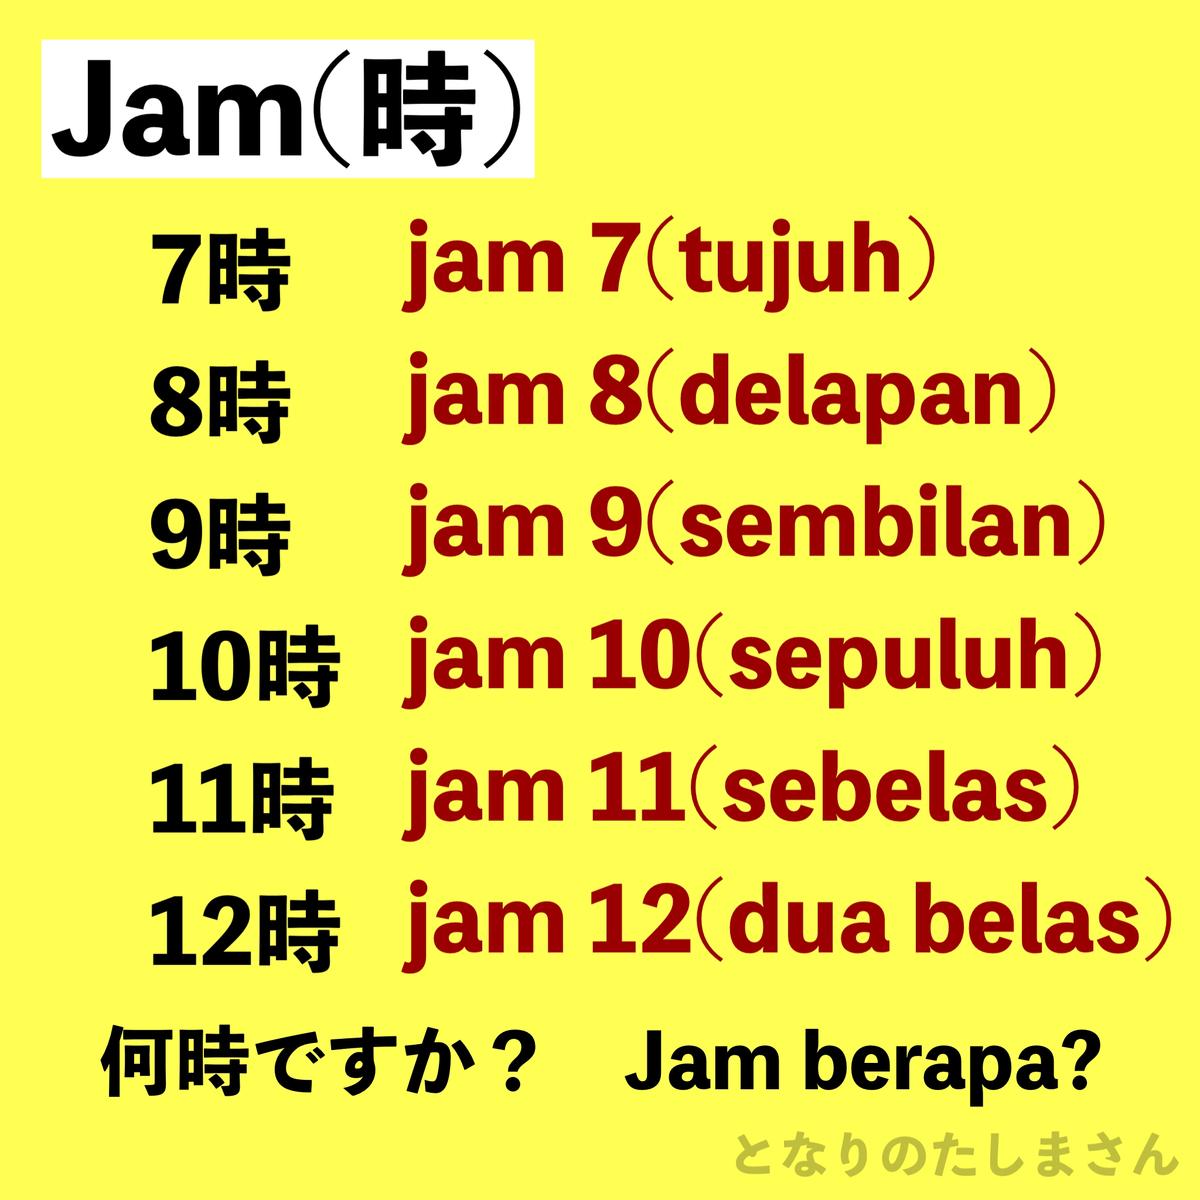 f:id:yutonsmaile:20210828170525j:plain